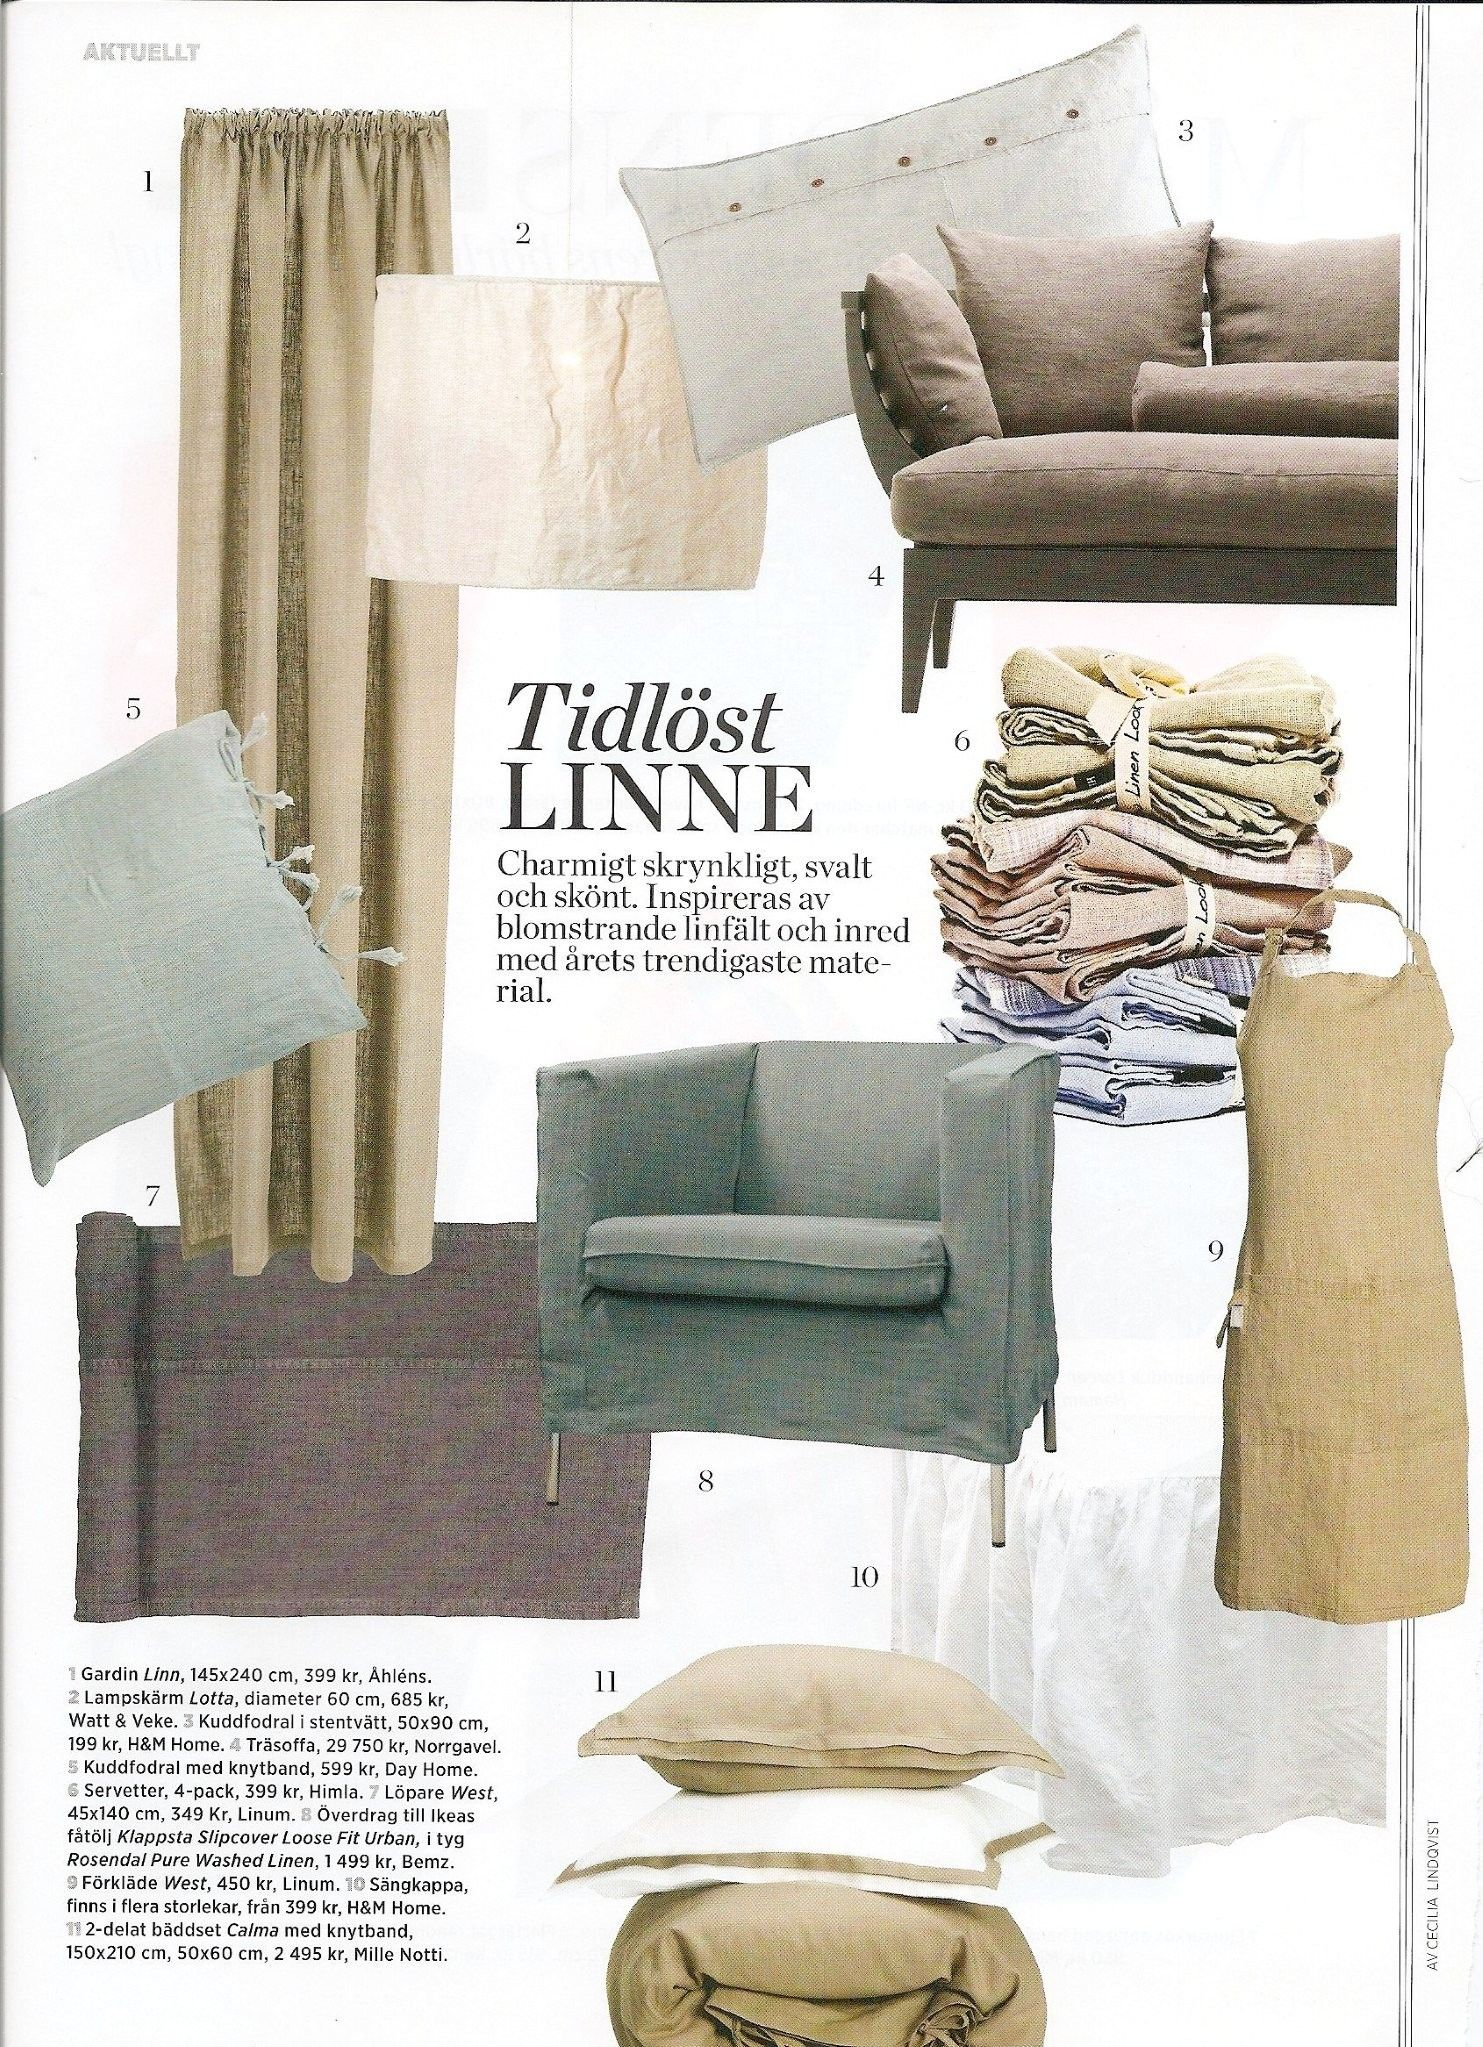 Amazing Klappsta Armchair Cover Loose Fit Home House Design Inzonedesignstudio Interior Chair Design Inzonedesignstudiocom